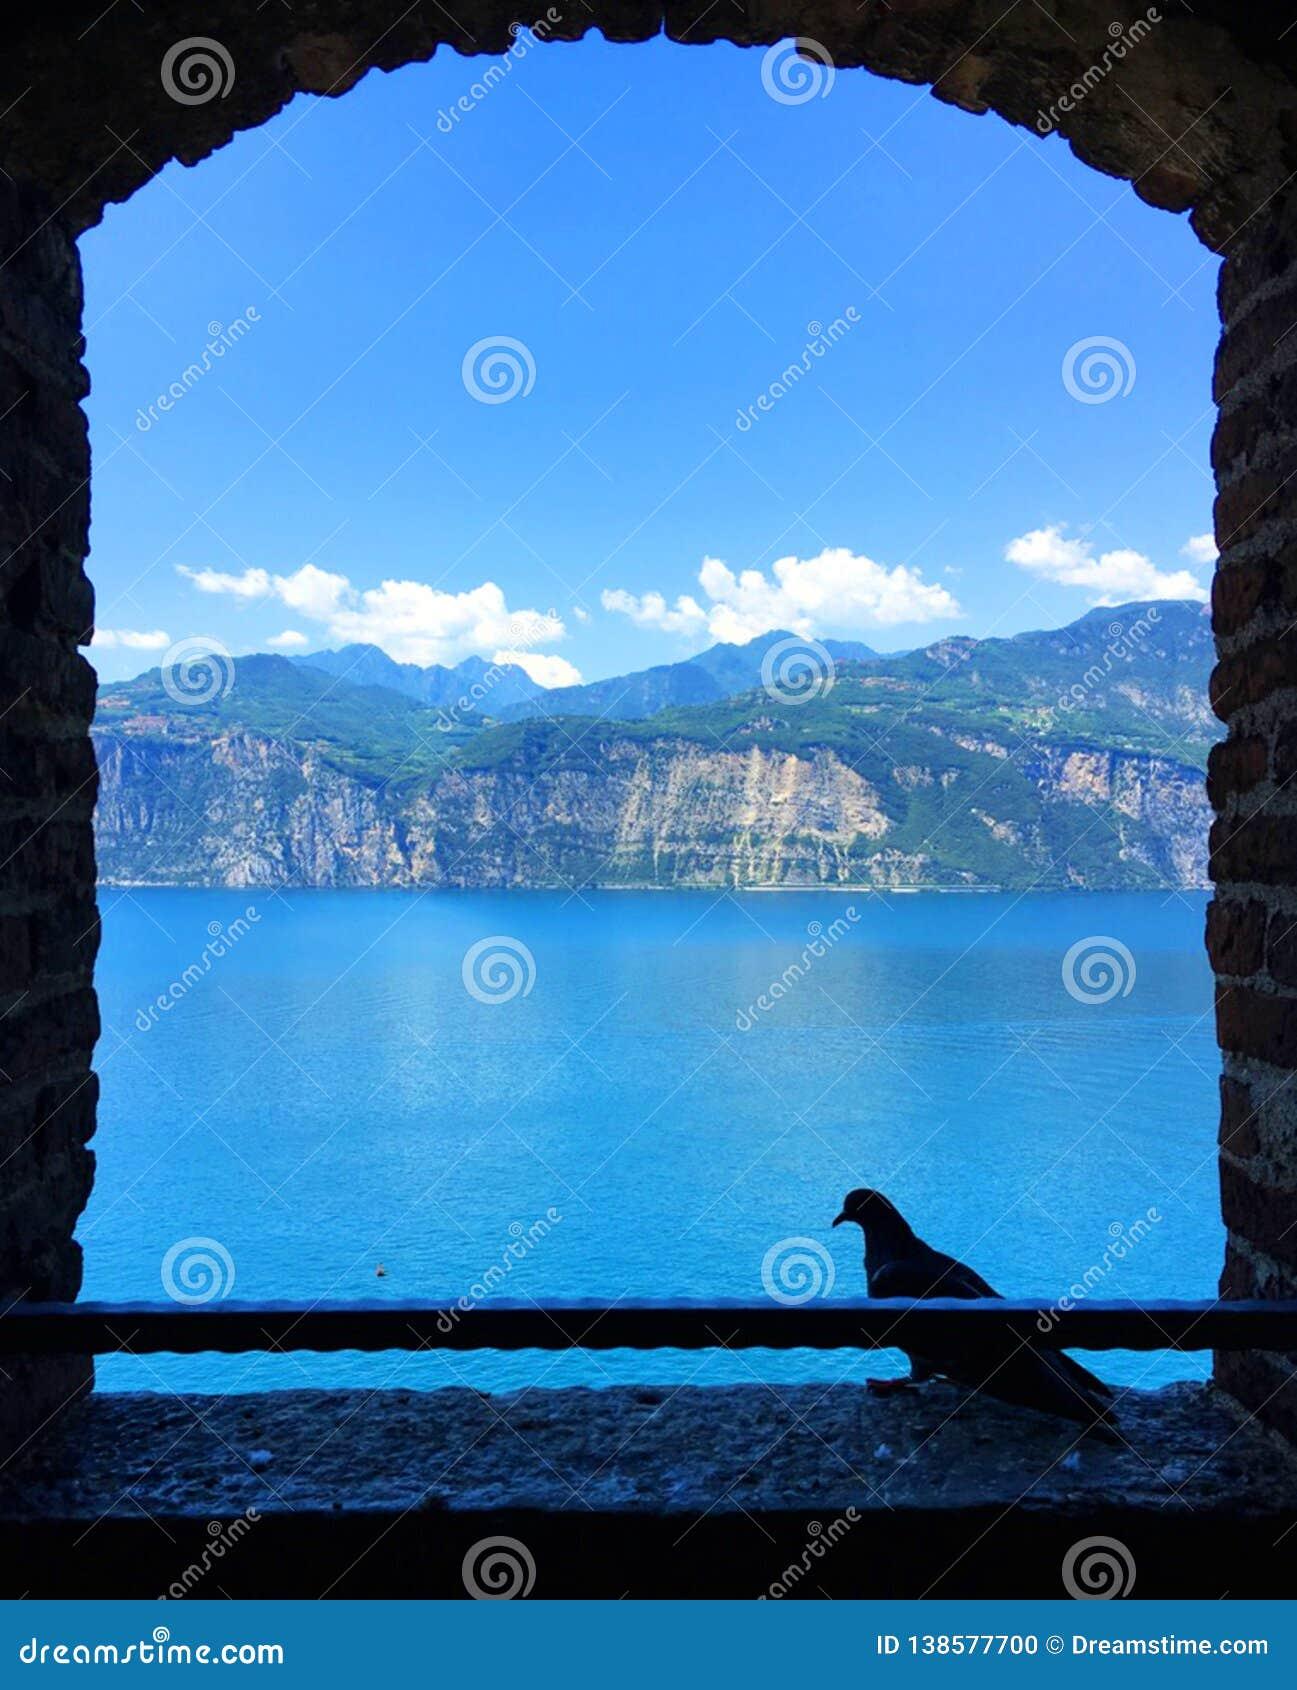 Mountain View tramite una finestra aperta